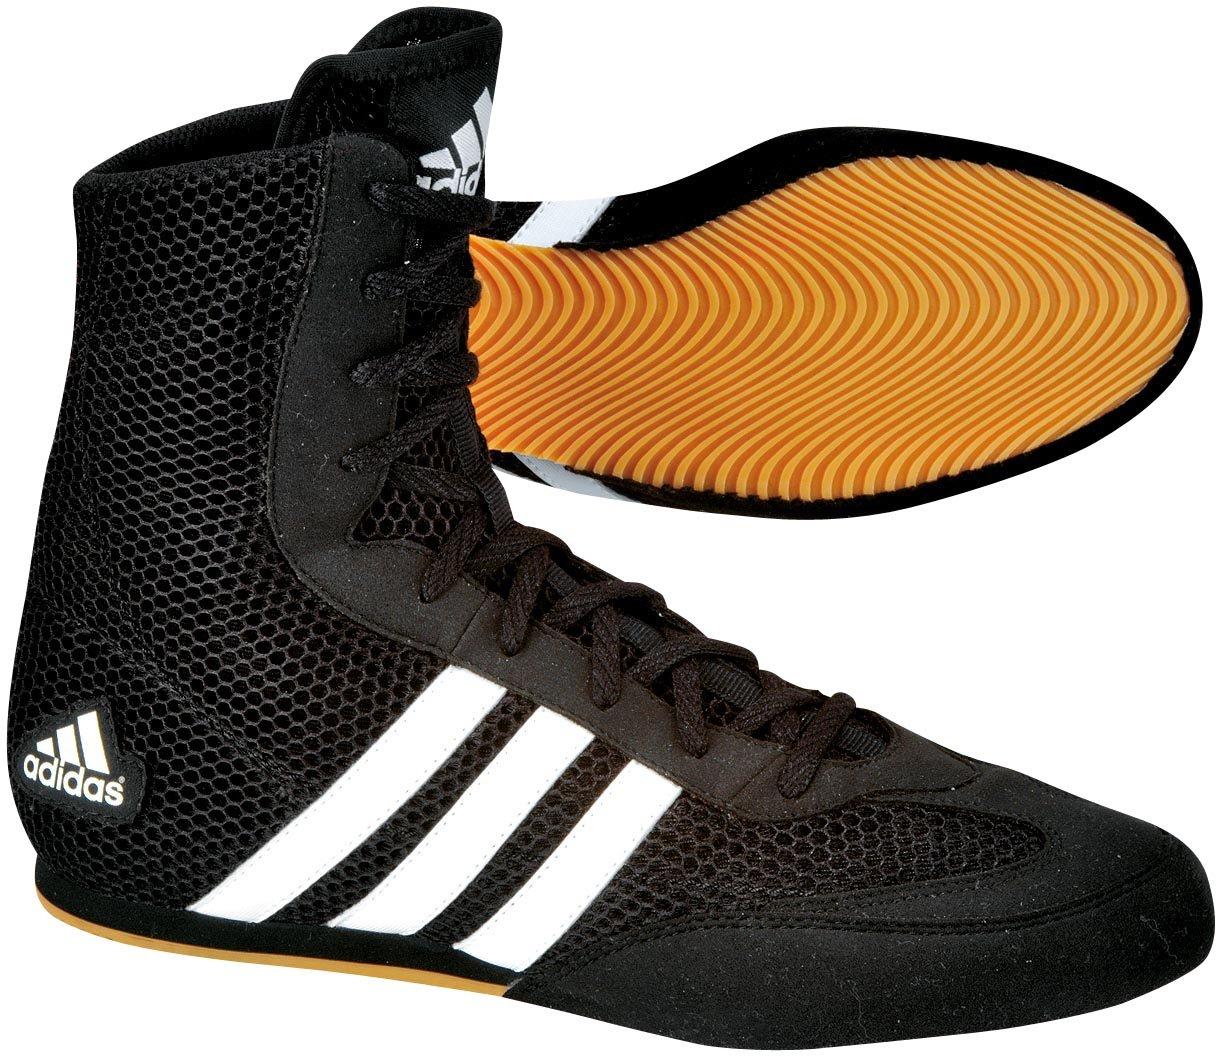 ADIDAS Schuhe Box Hog Boxhandschuhe Schwarz: